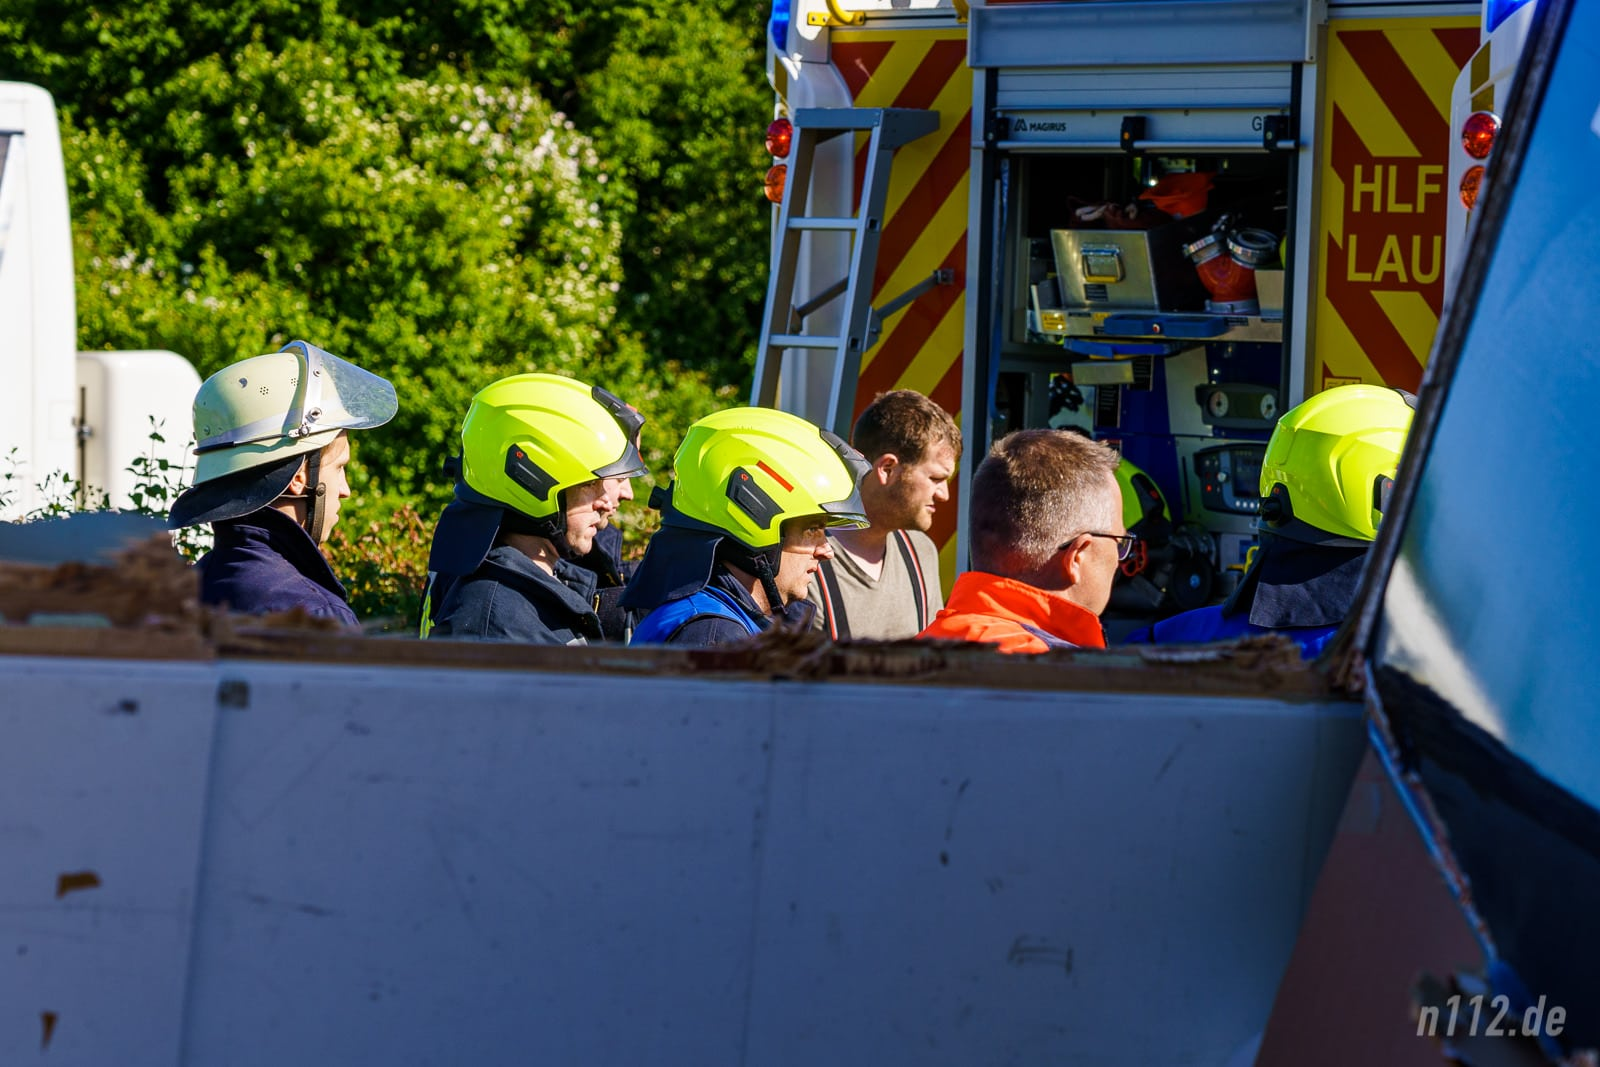 Feuerwehrleute besprechen die Bergung des Toten (Foto: n112.de/Stefan Simonsen)